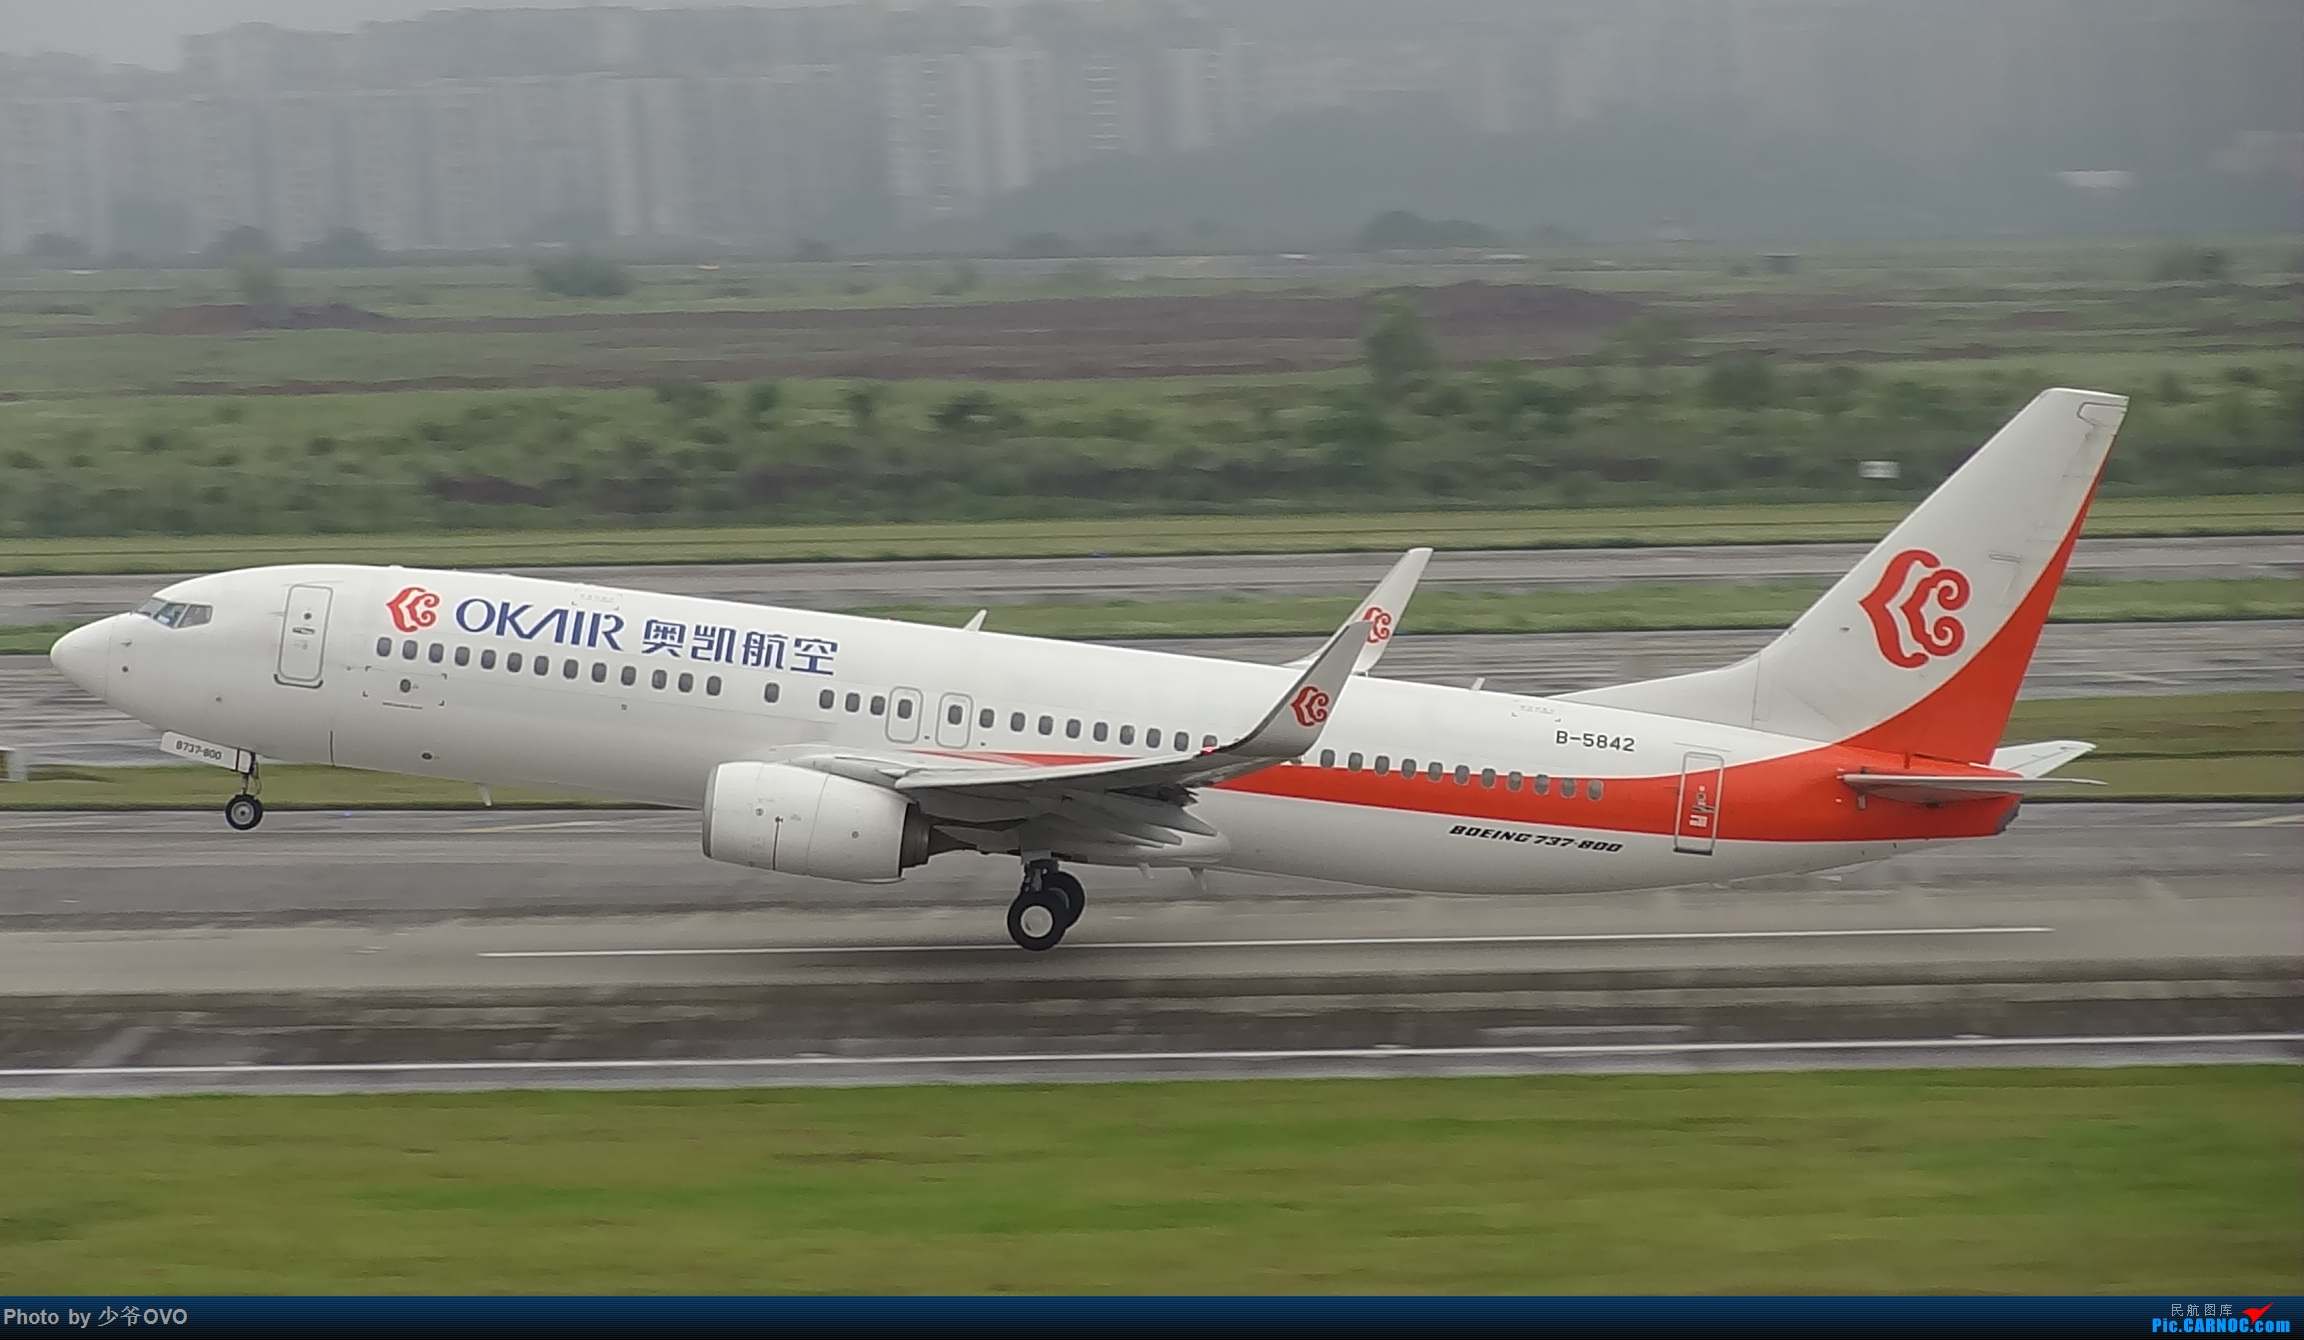 Re:[原创]CKG重庆江北机场拍机 ,中法建交50周年 BOEING 737-800 B-5842 中国重庆江北国际机场